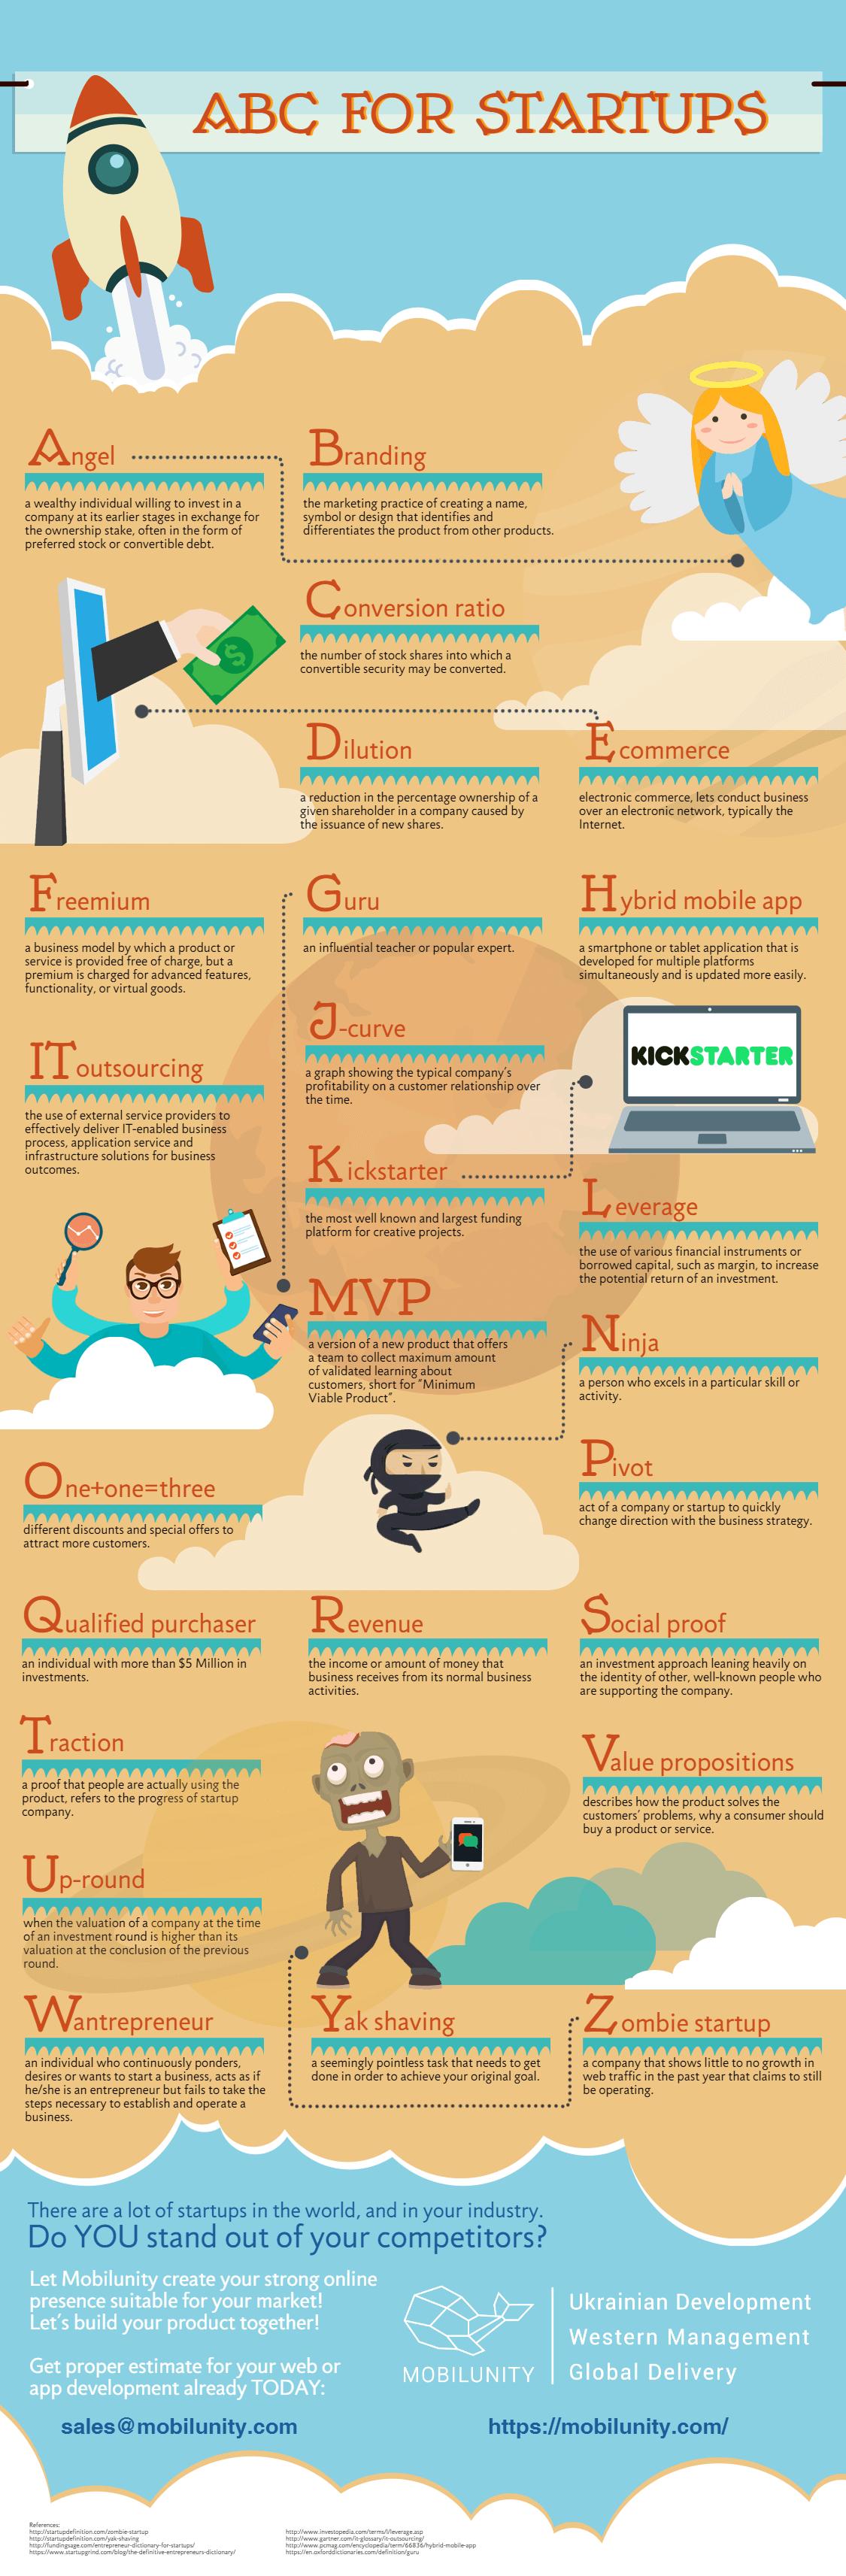 Best Web Development Company for Startup Development